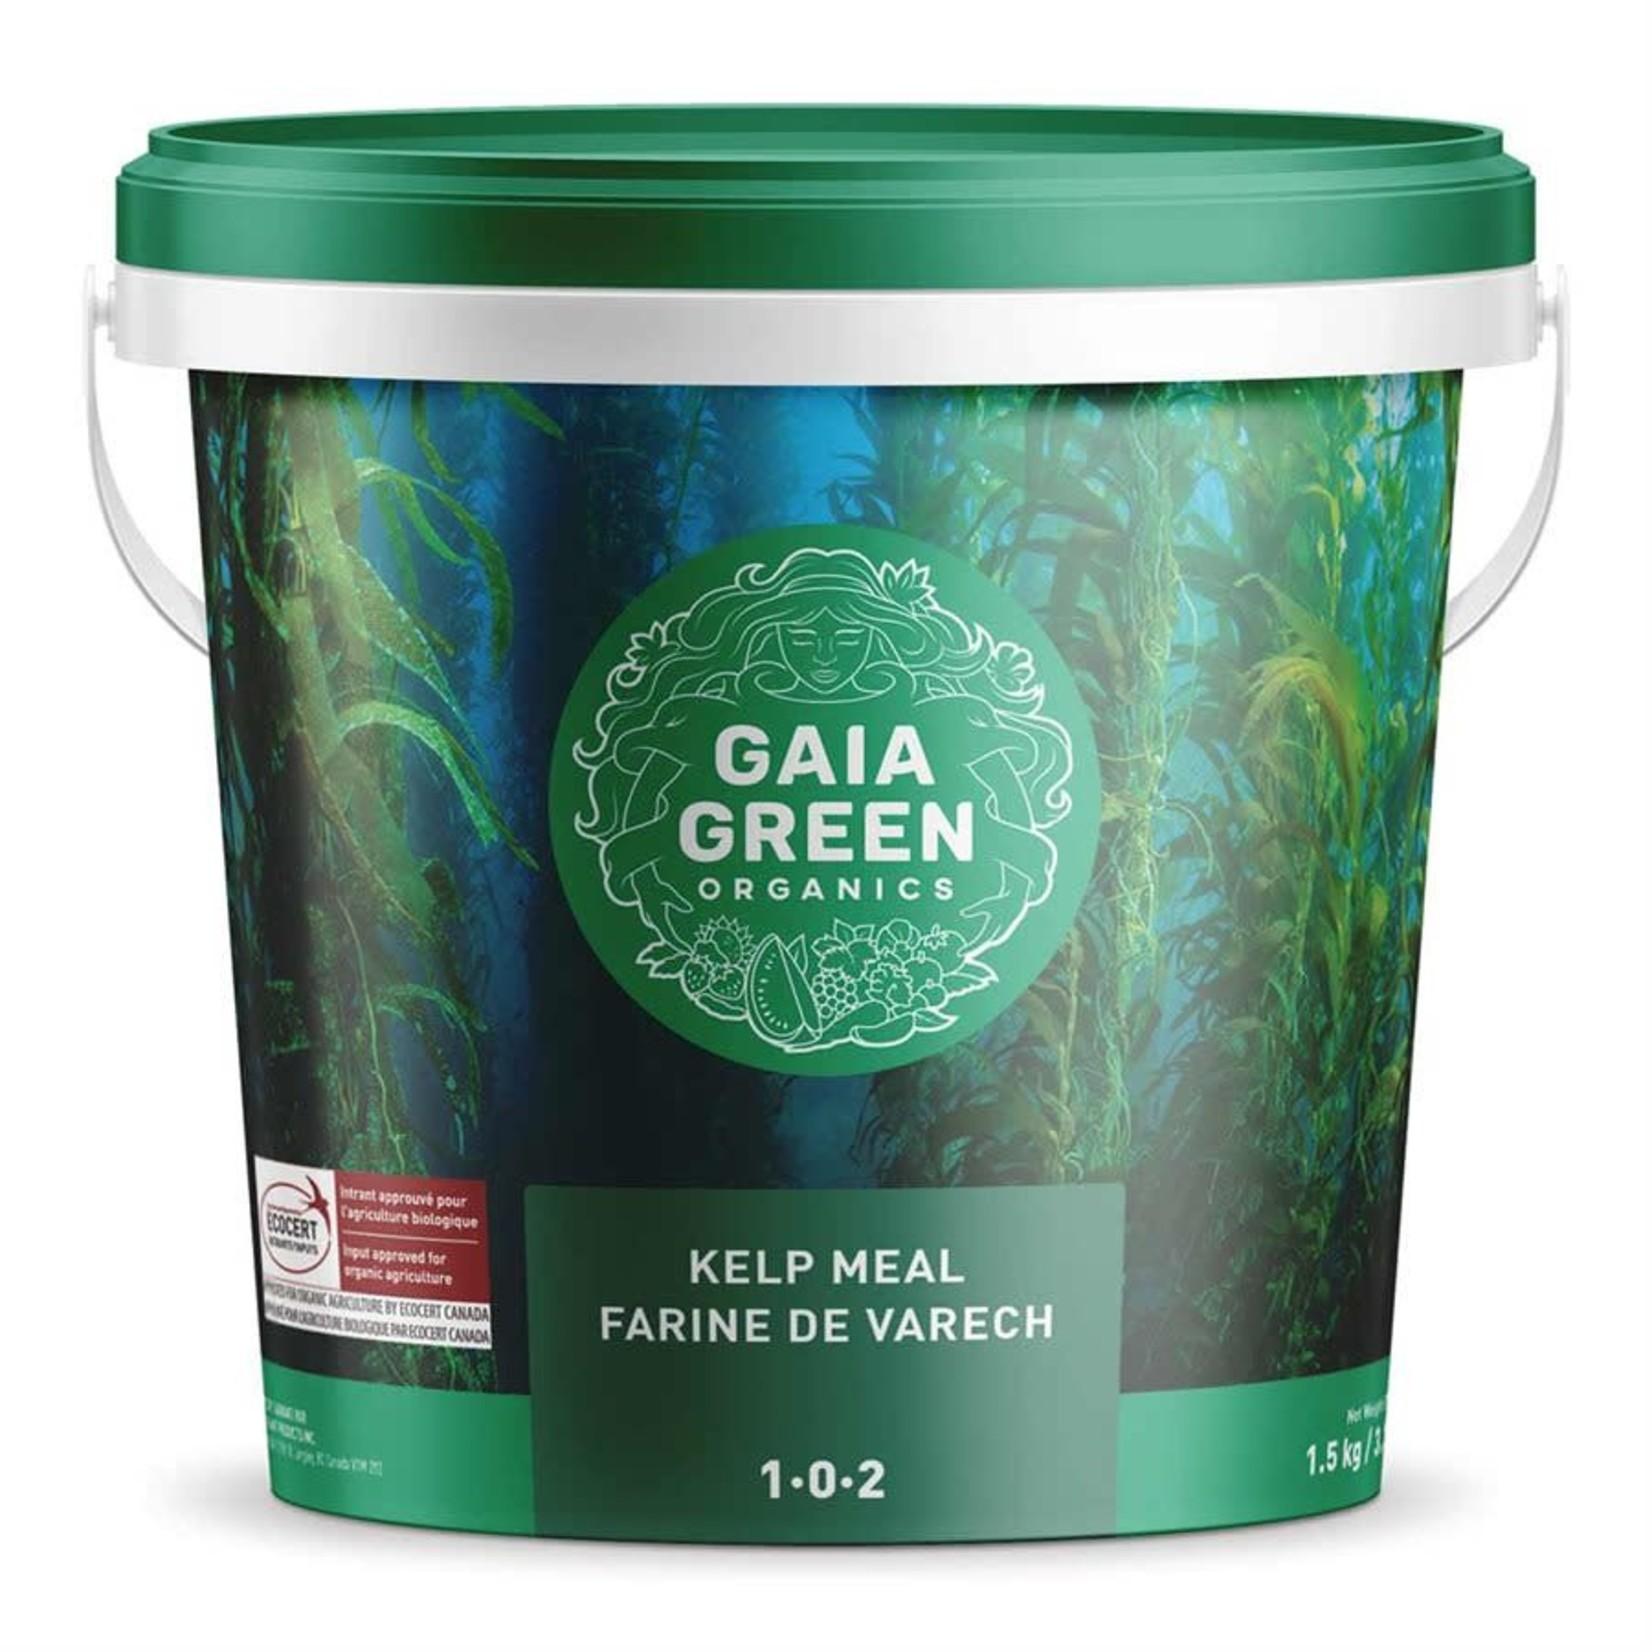 Gaia Green Kelp Meal 1-0-2, 1.5kg